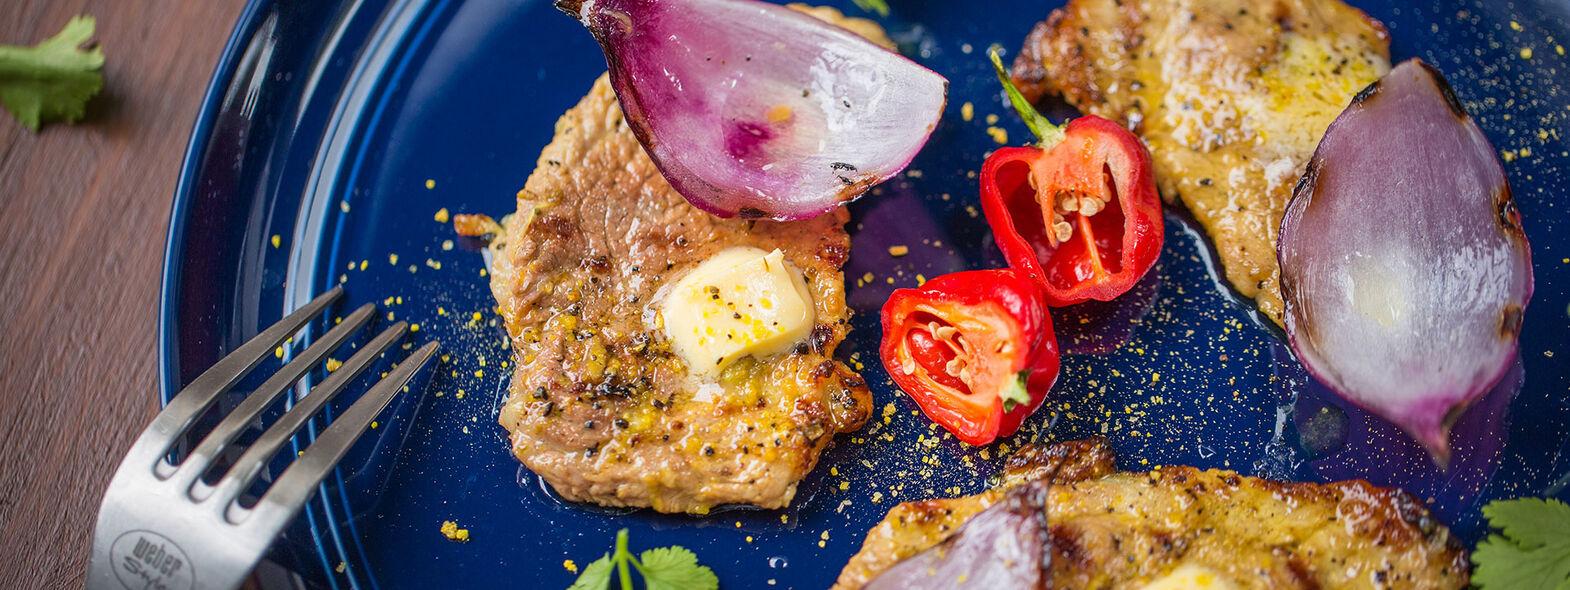 Steaks de Cerdo al Limón